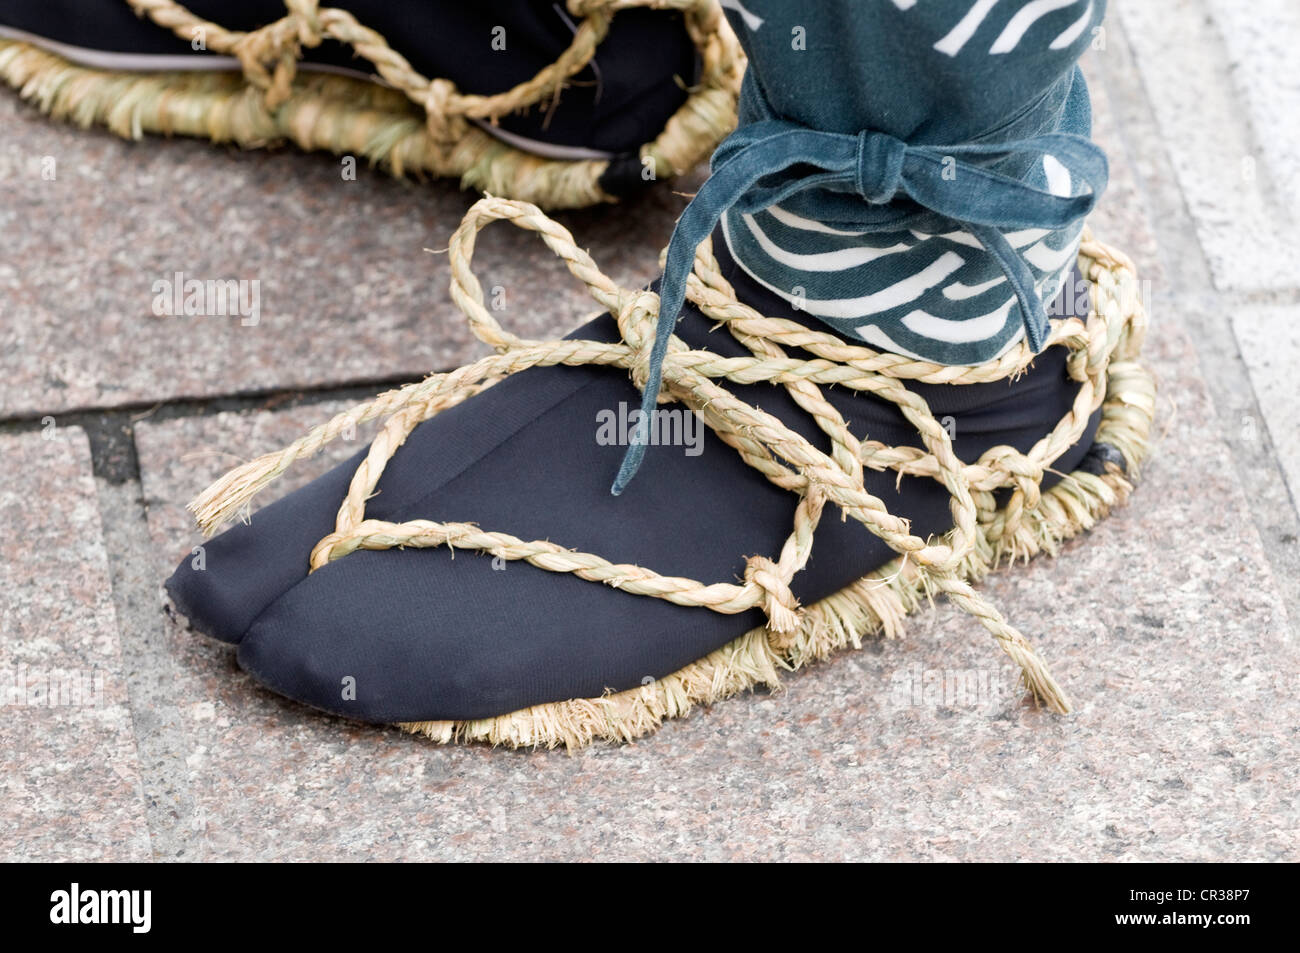 Takayama, Festival oder Sanno Matsuri, Schuhe Detail, Chubu Region, Insel Honshu, Japan Stockbild